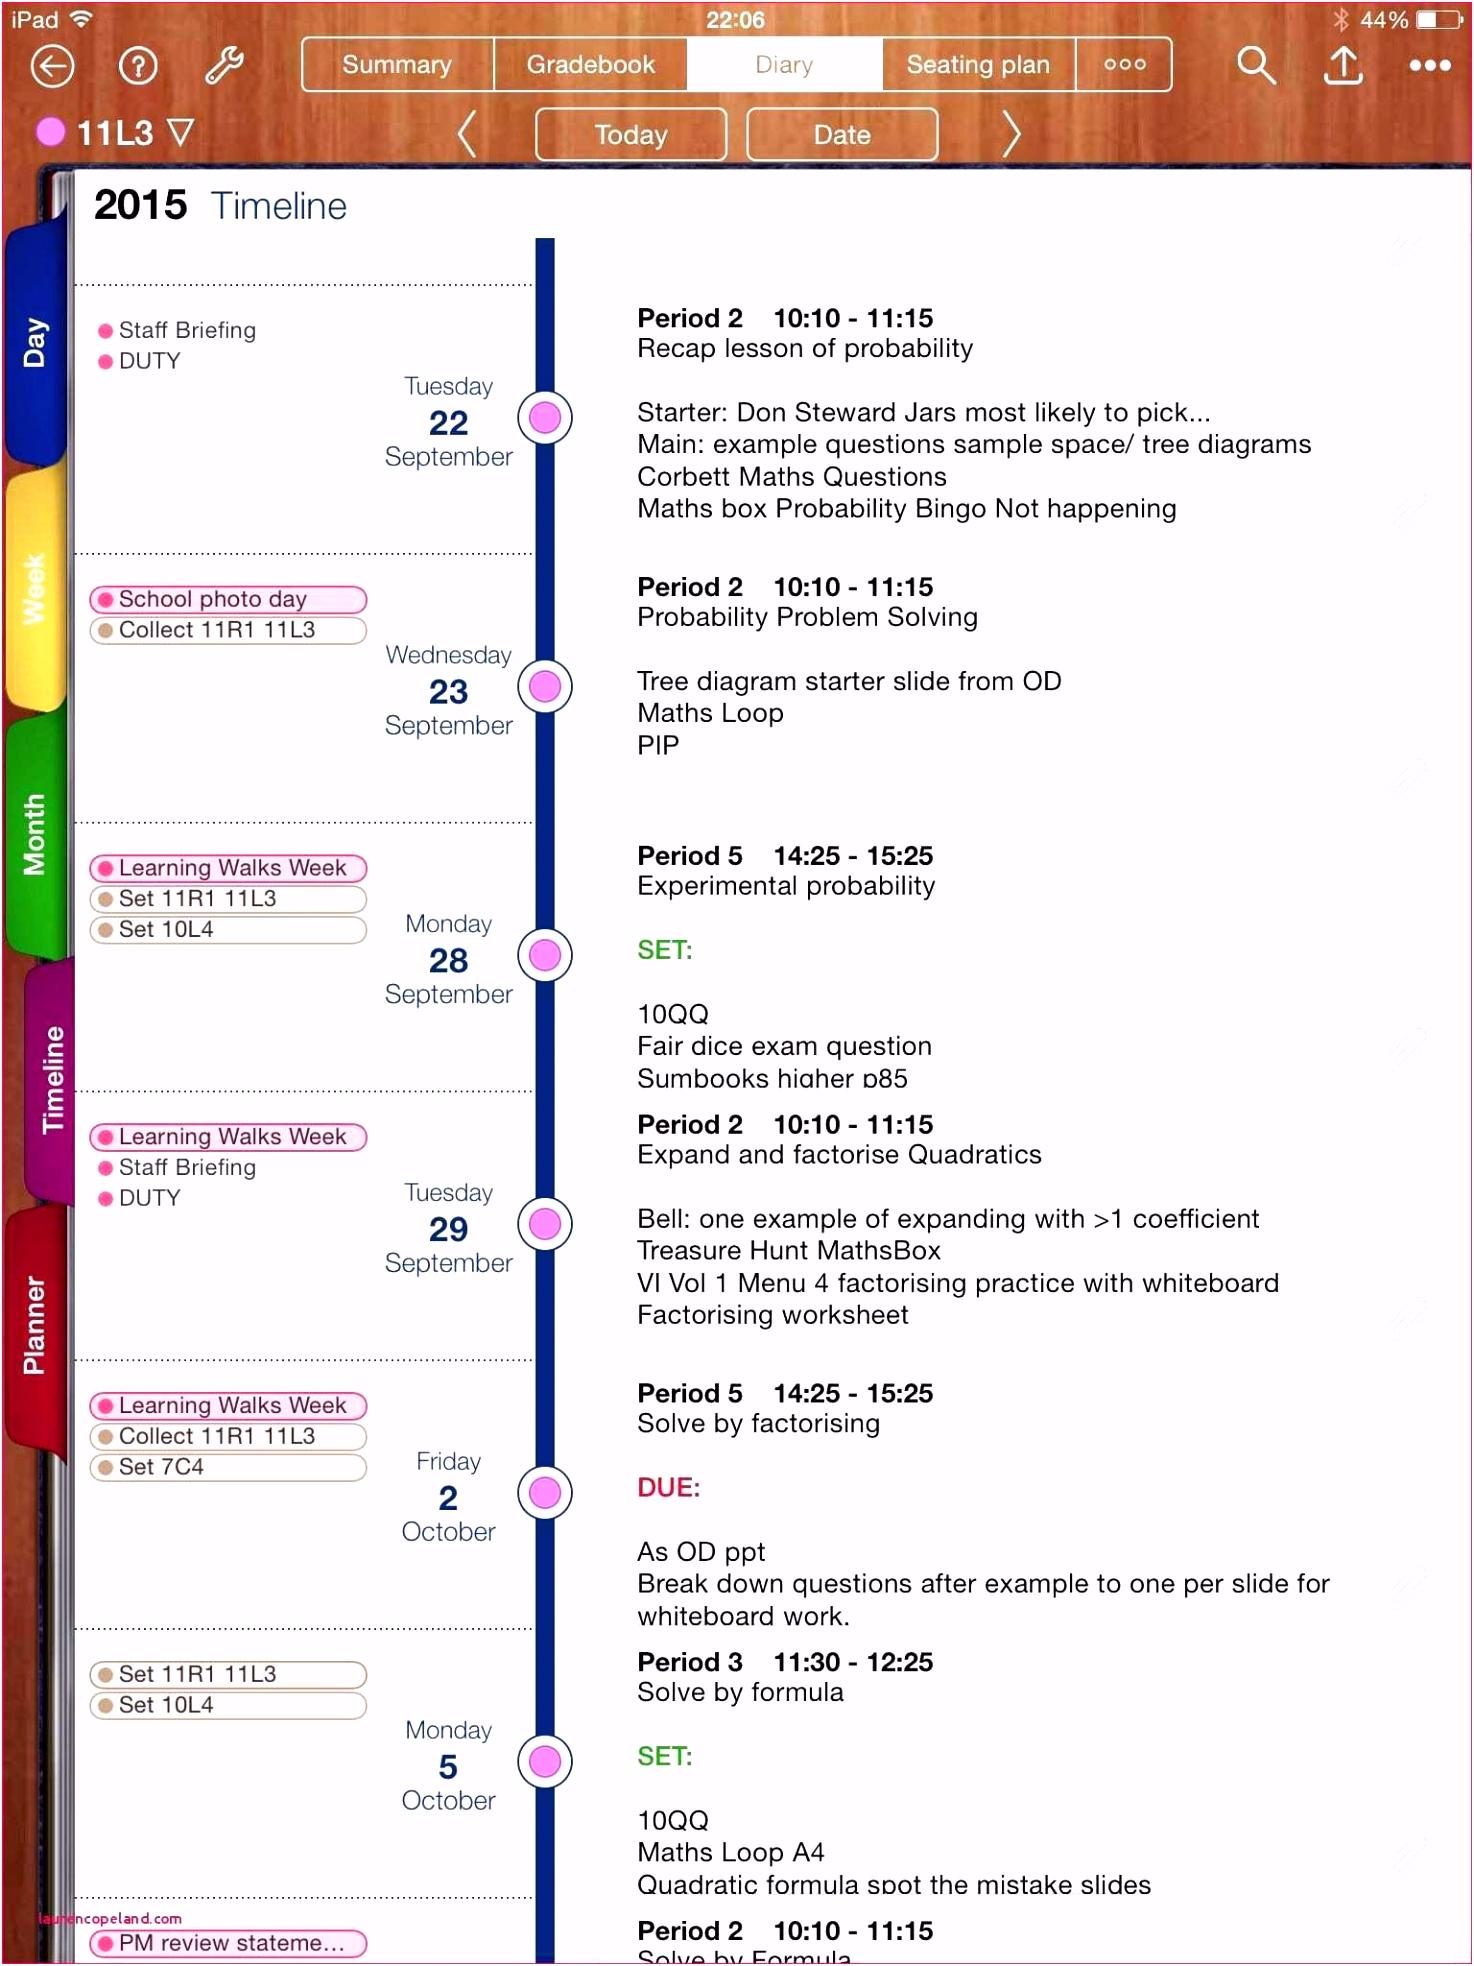 Gratis Download Arbeitsplan Excel Vorlage